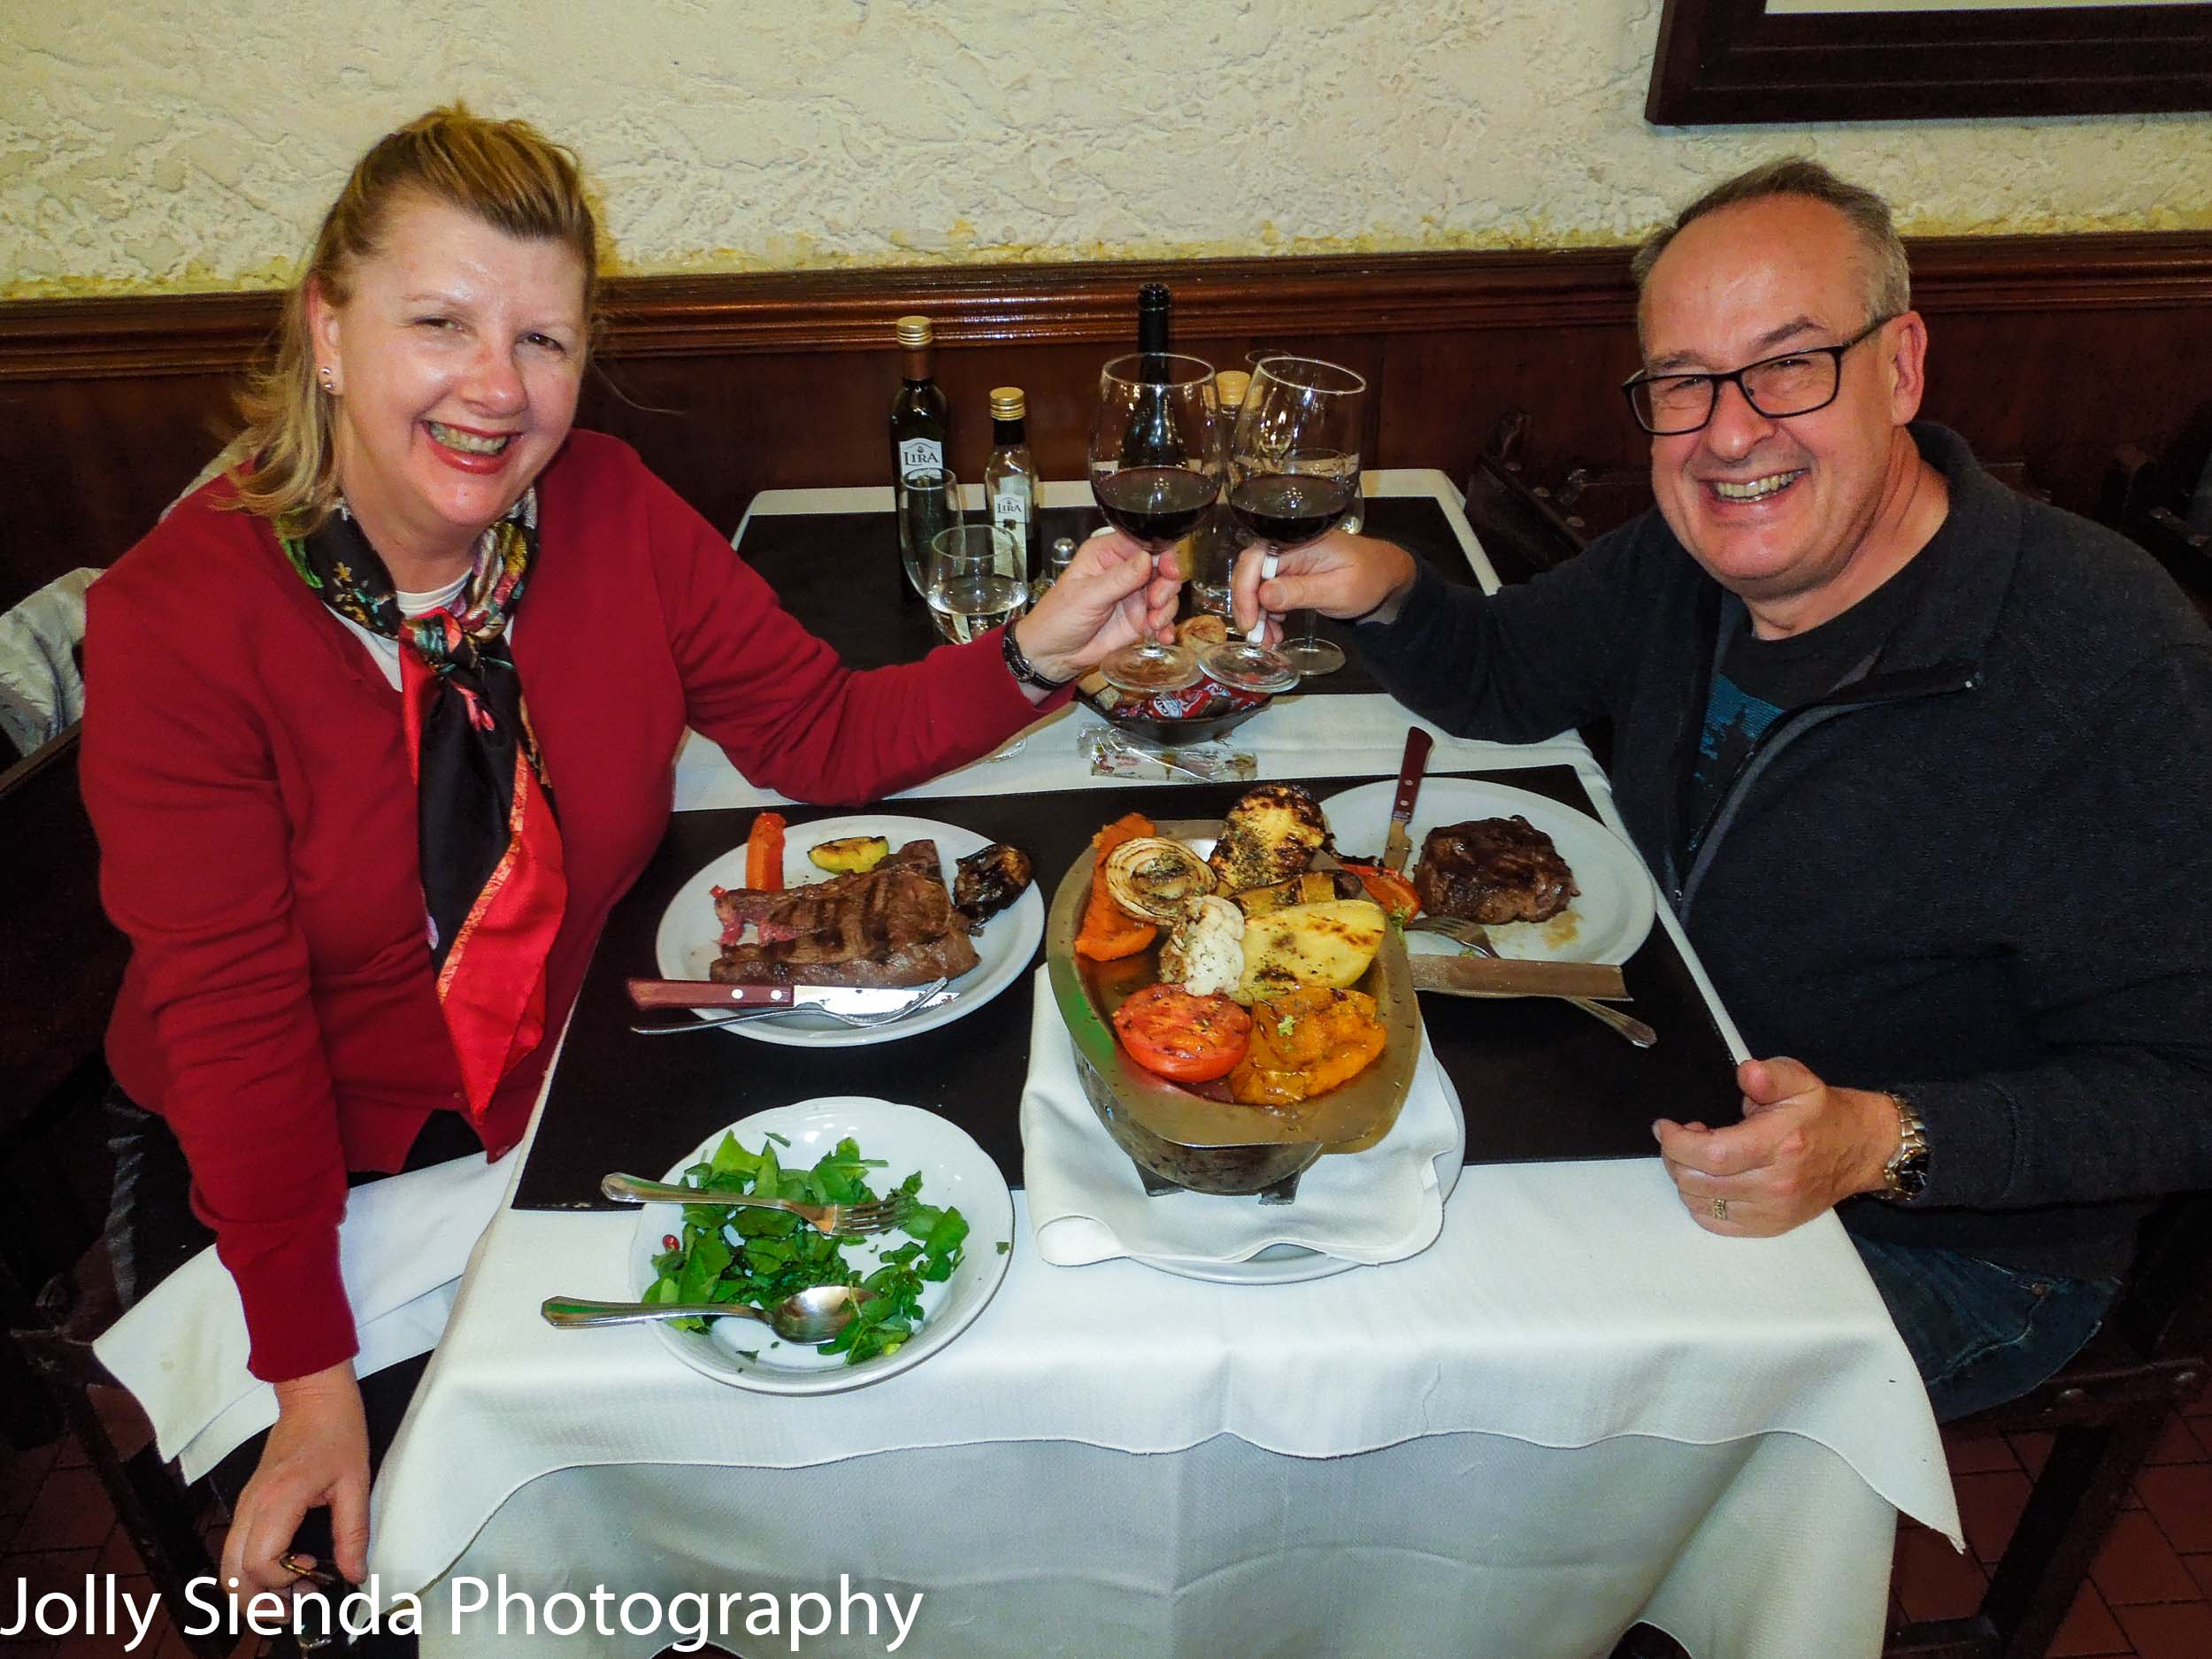 Jolly and Rich eat a steak dinner